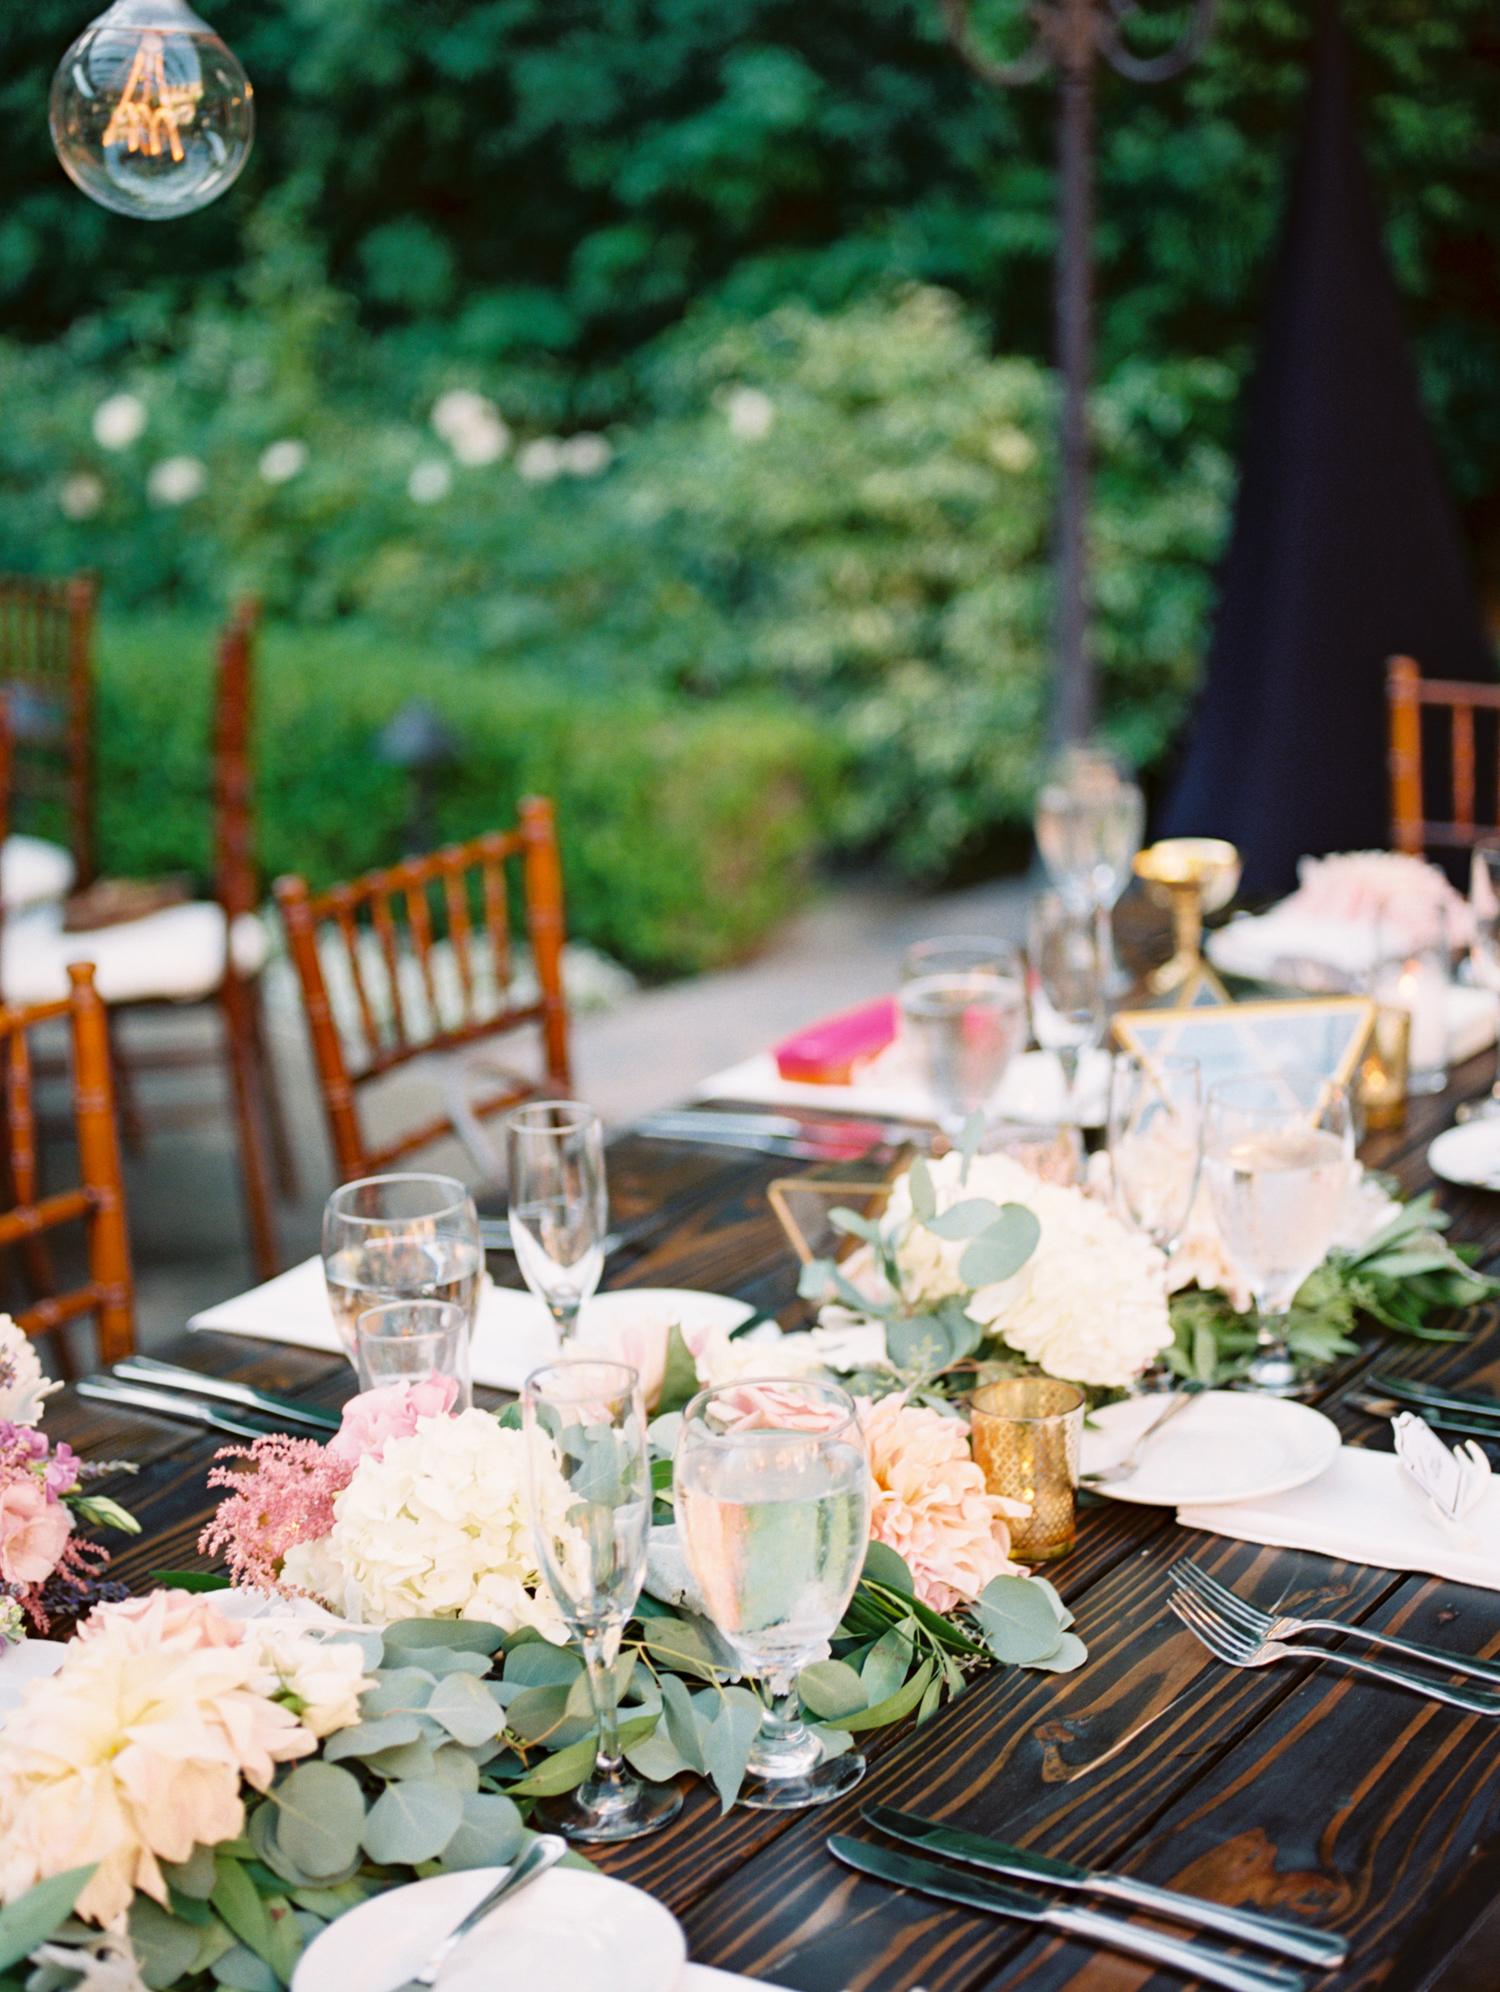 070-Jen-Wojcik-Photography-San-Diego-Wedding-Photographer.jpg